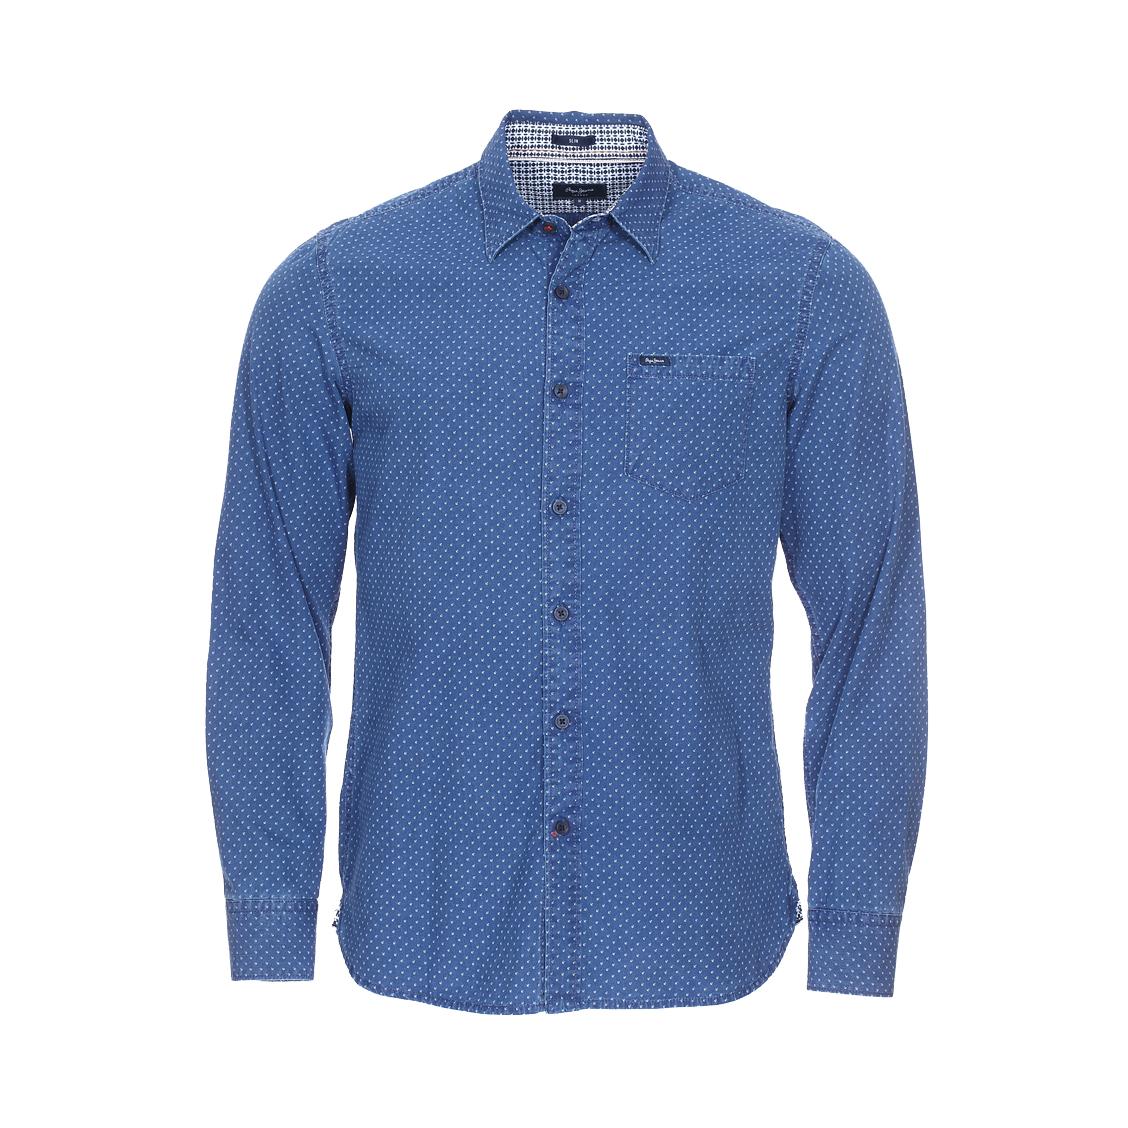 Chemise cintrée  kaoru bleu indigo à motifs blancs